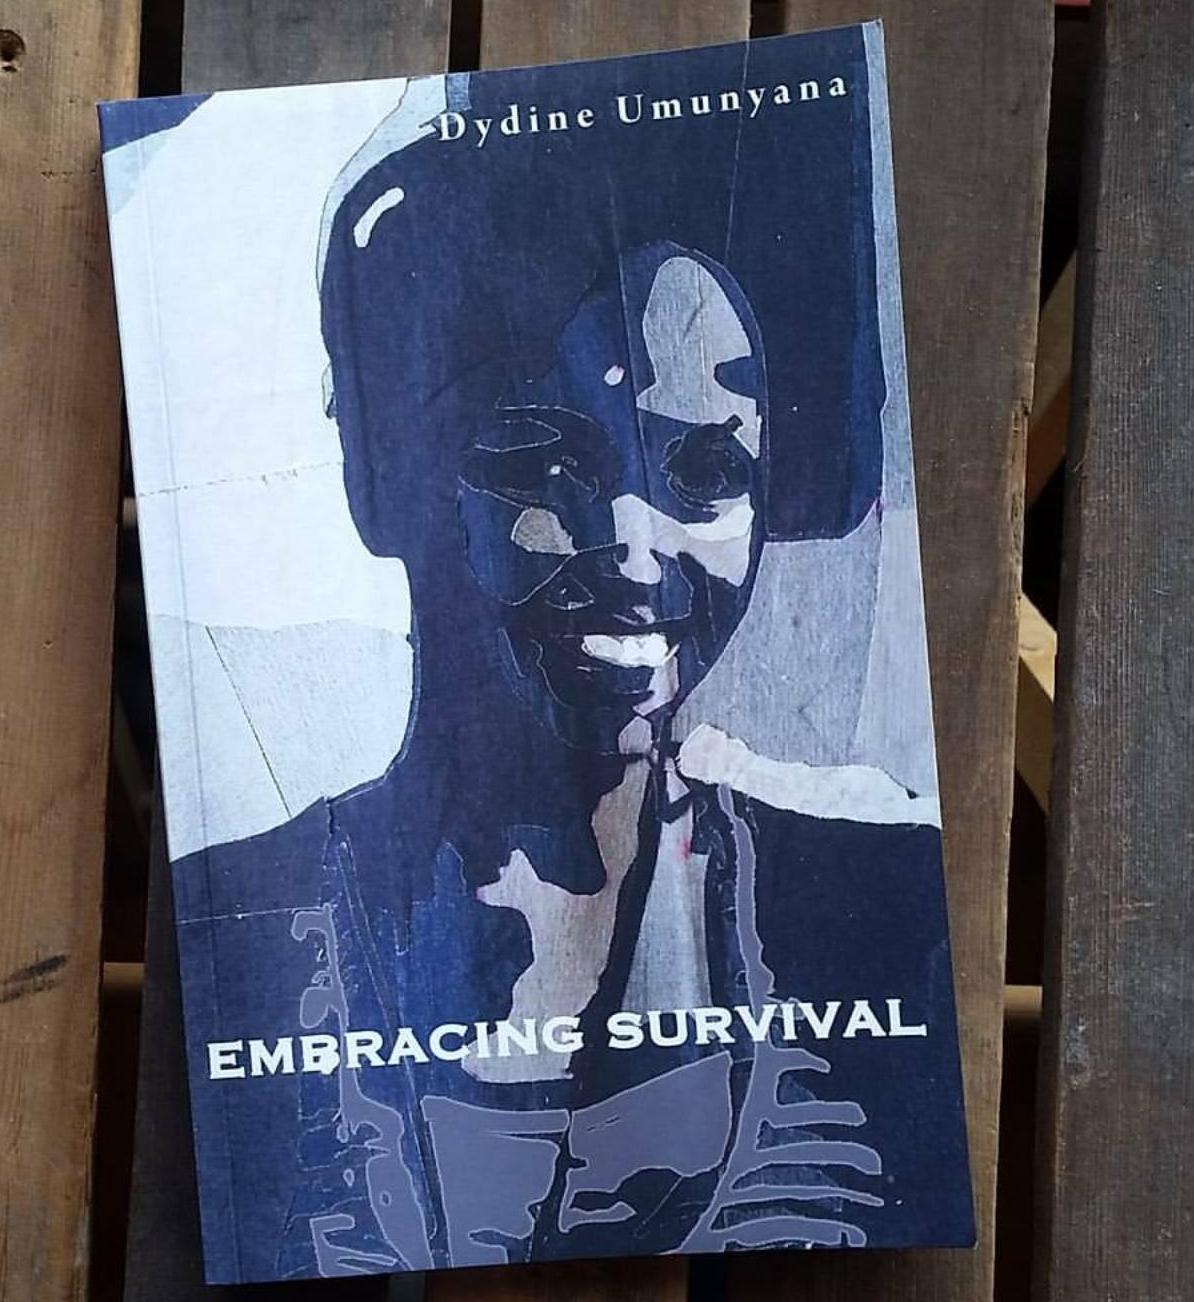 Embracing Survival - A memoir by Dydine Umunyana